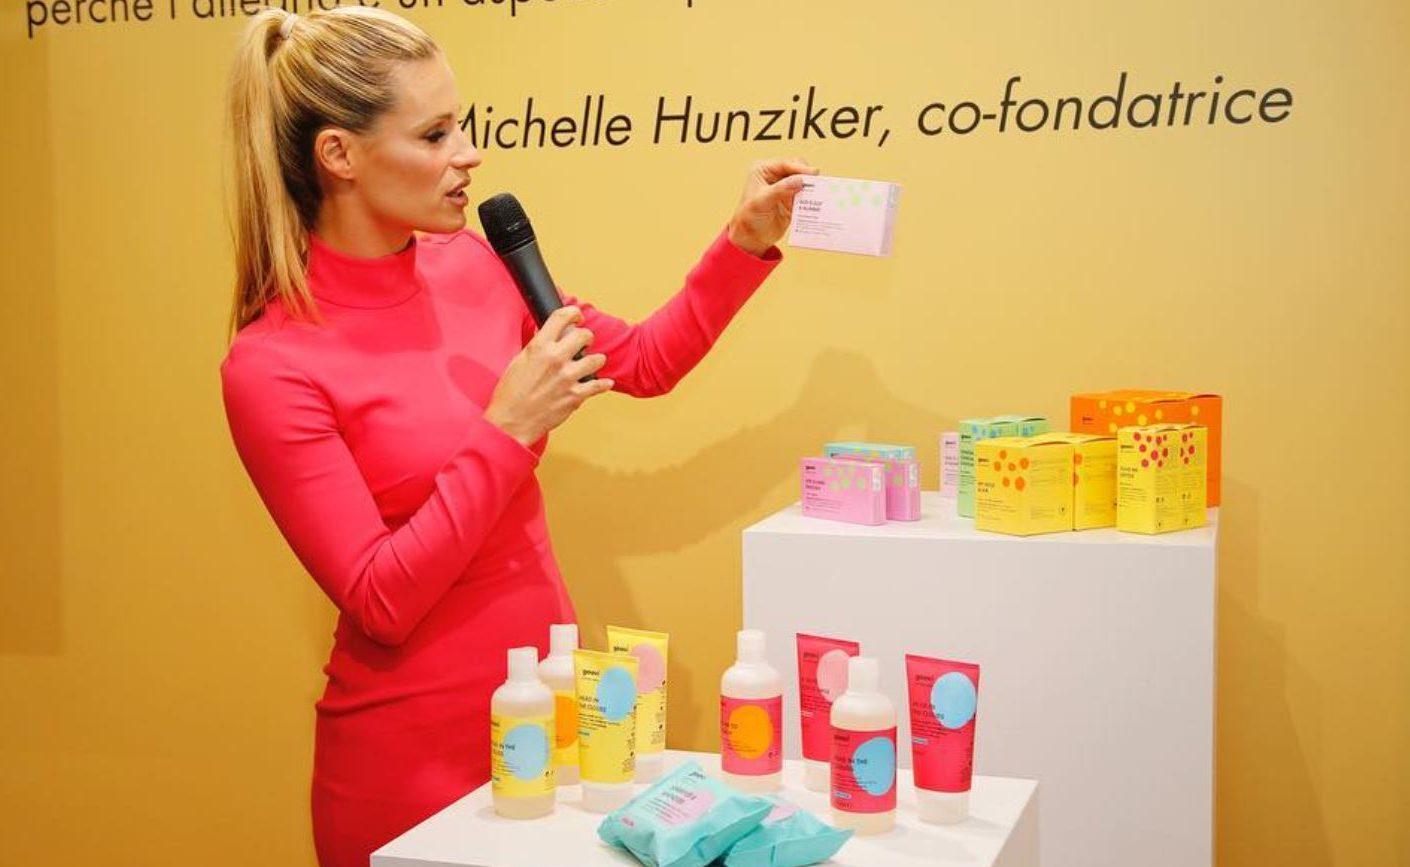 Michelle Hunziker consigli di bellezza